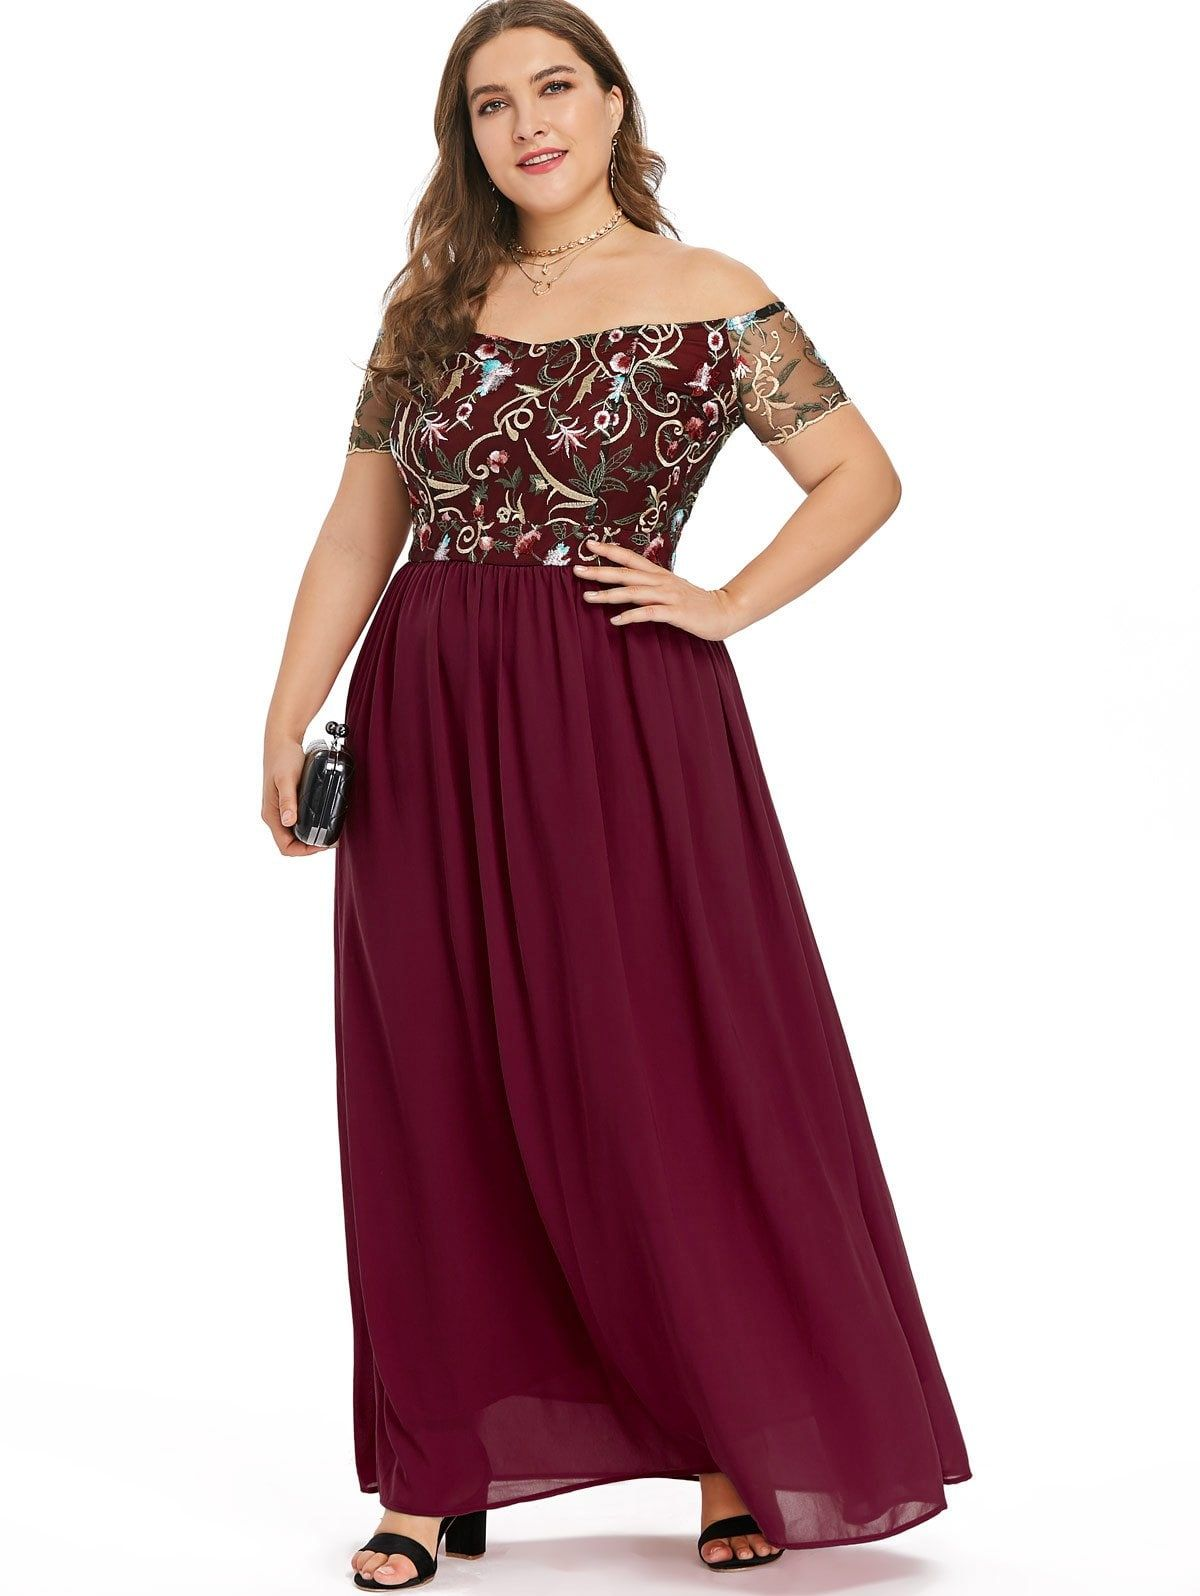 Elastic waist plus size embroidery maxi dress backless